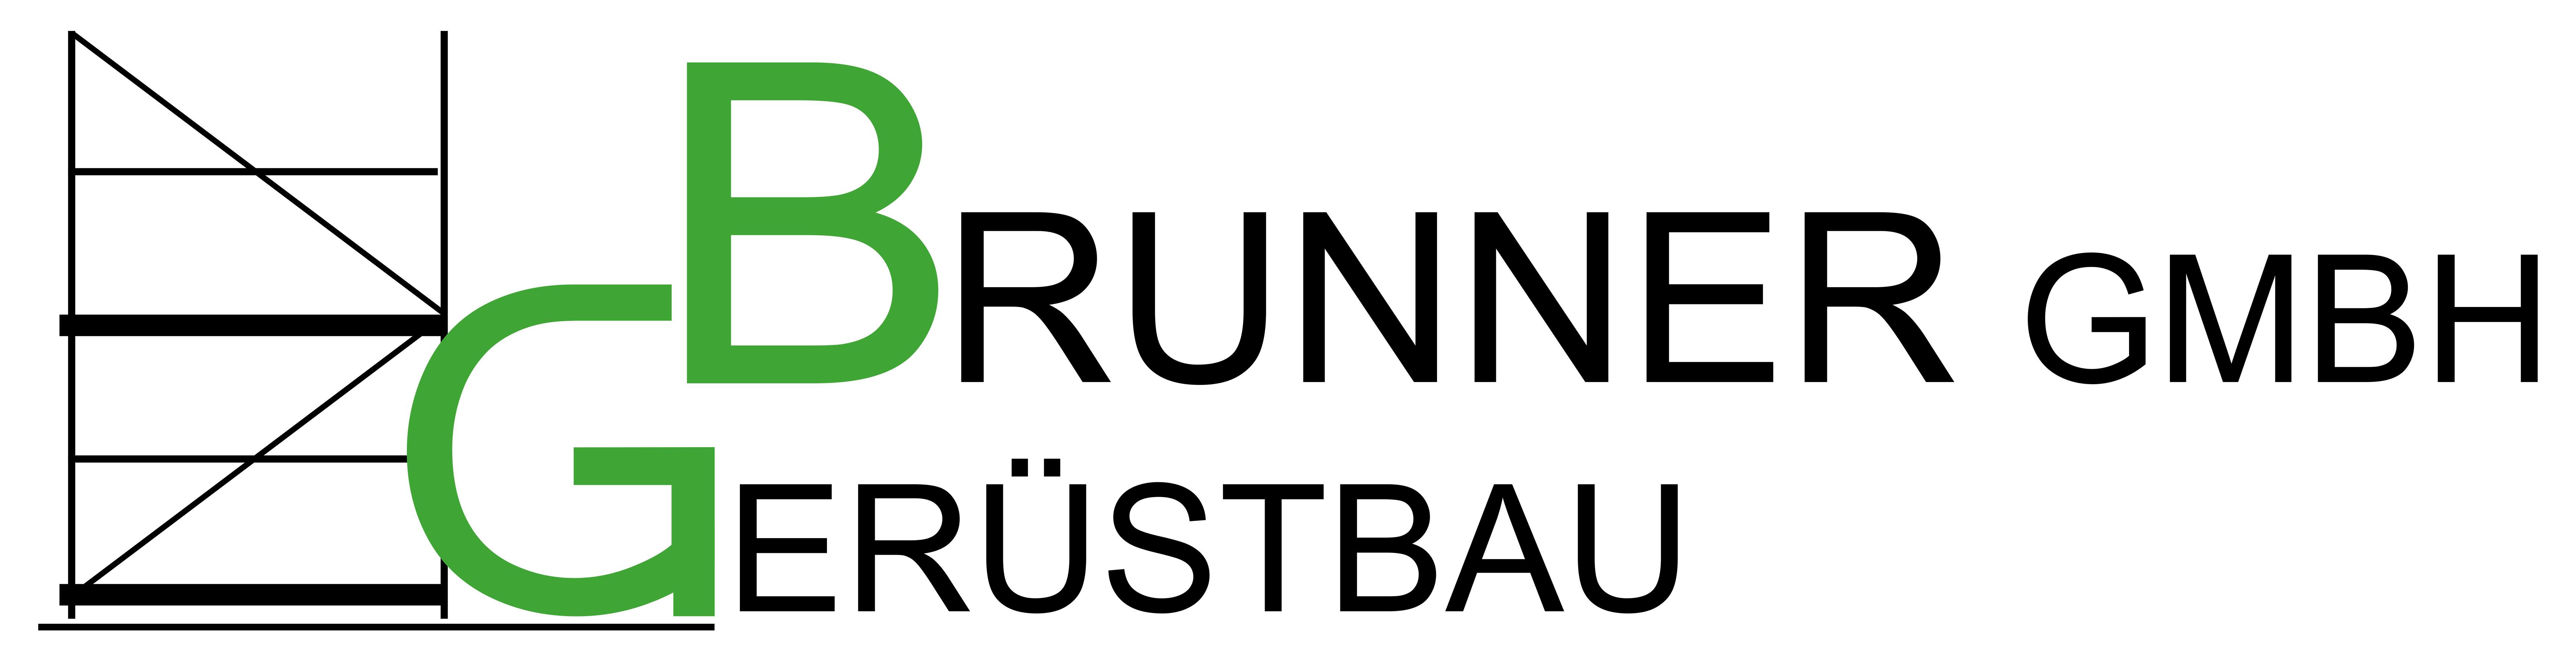 Gerüstbau Brunner GmbH